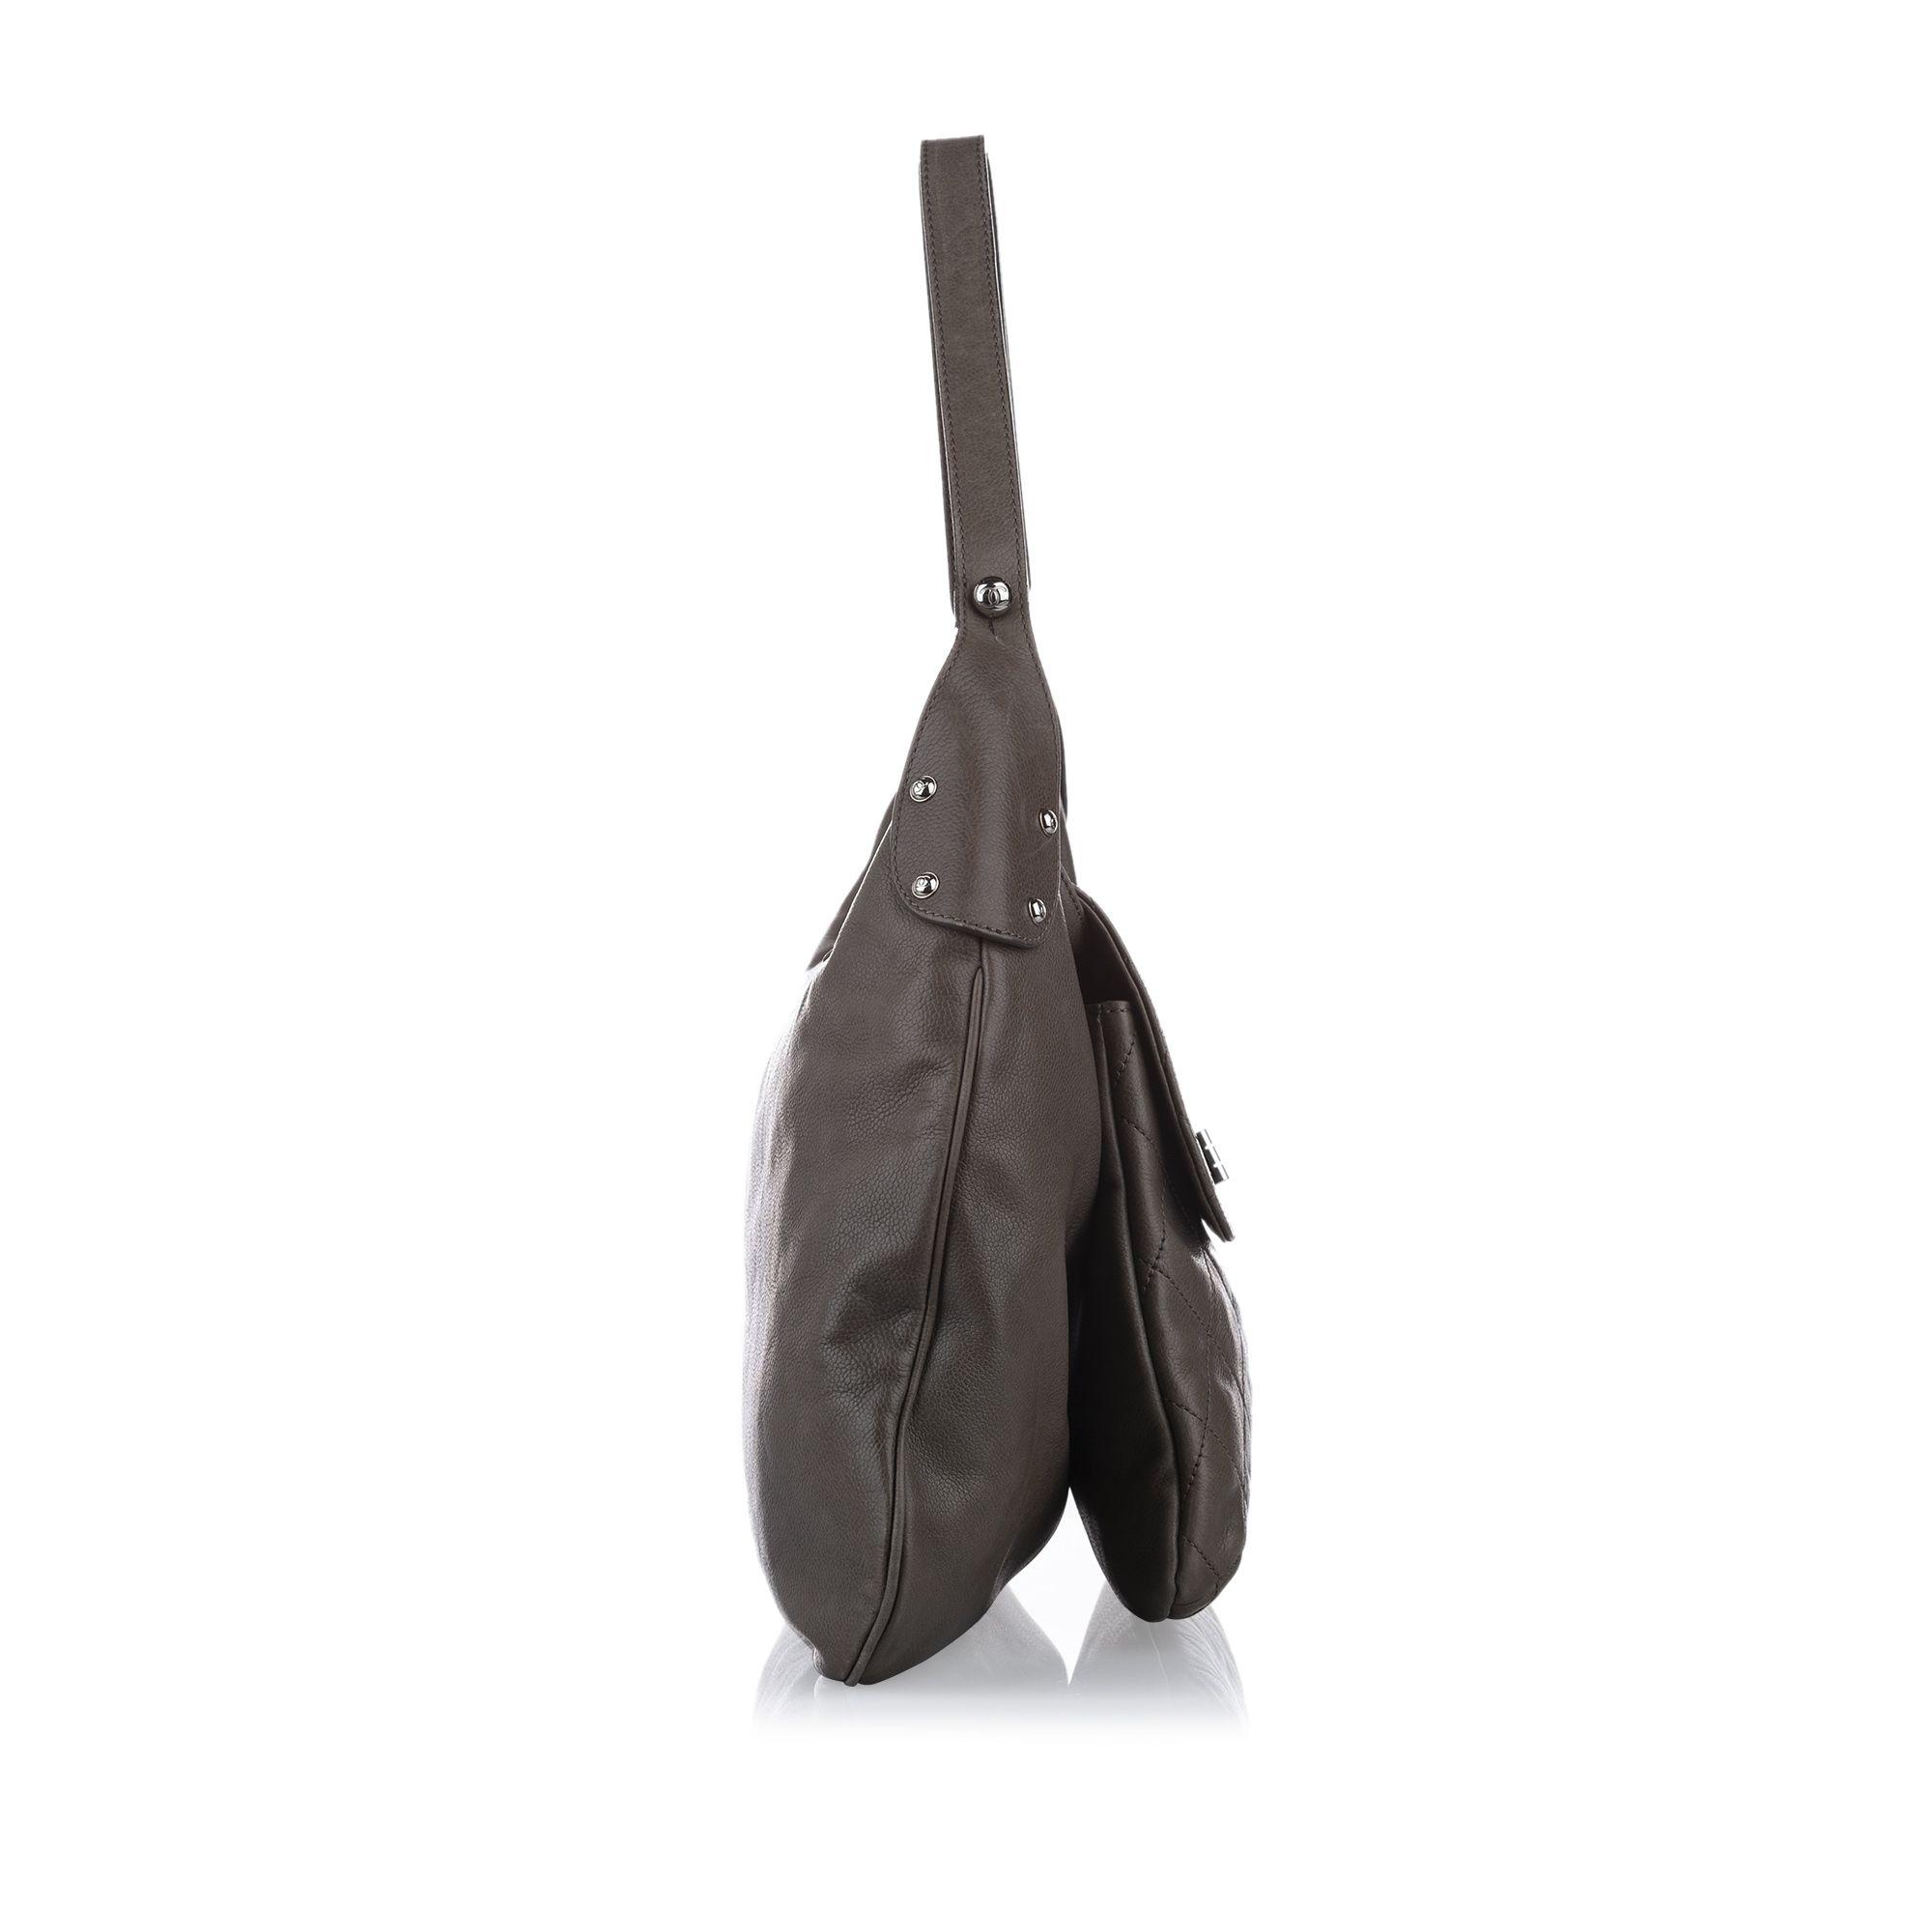 Vintage Chanel Matelasse Reissue Lambskin Leather Flap Bag Brown